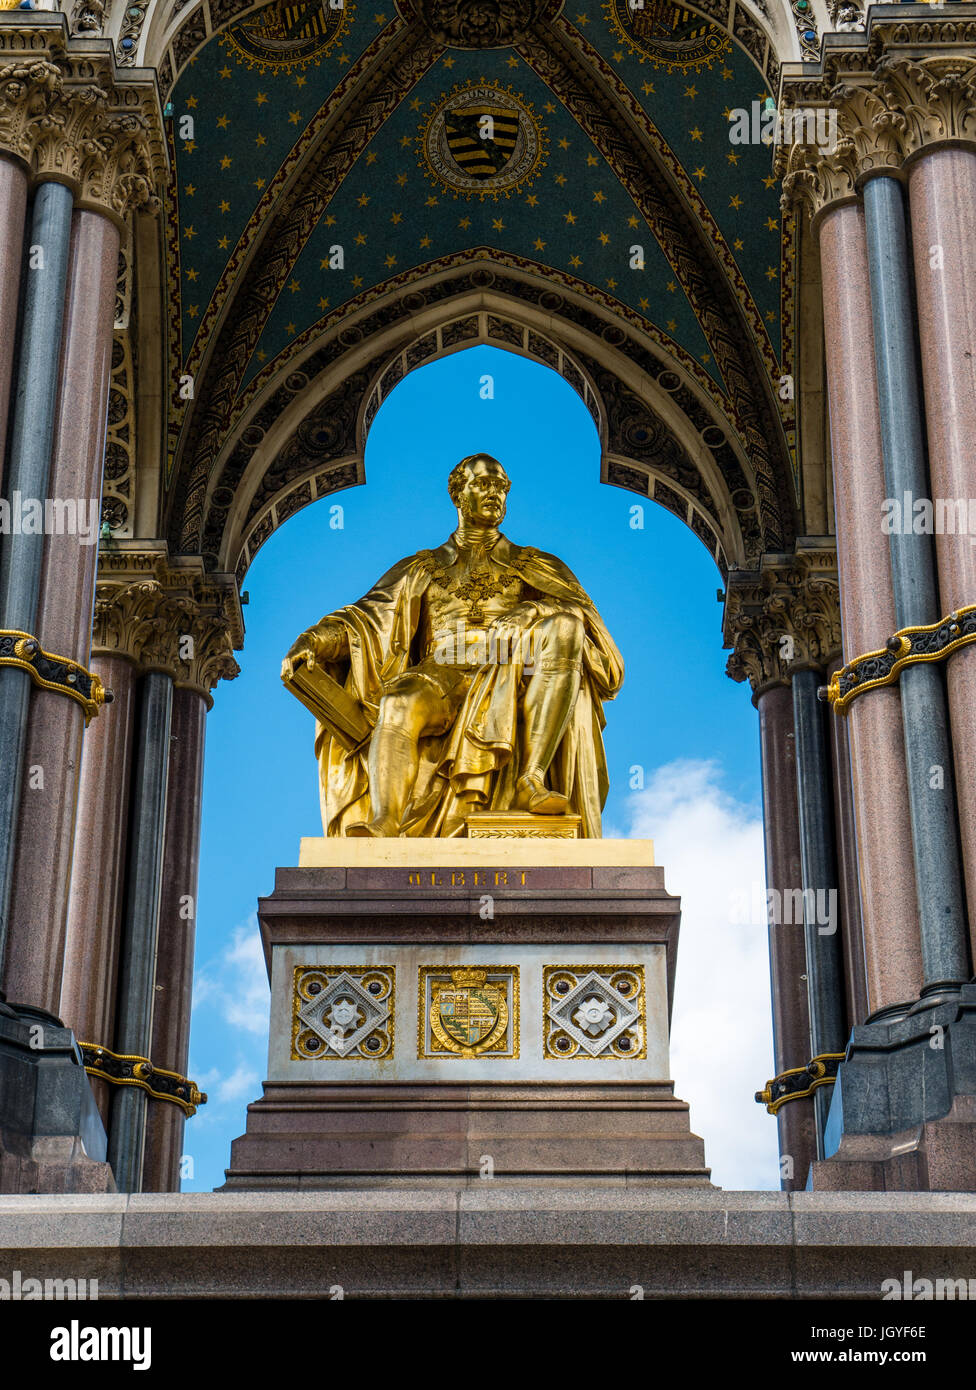 The Albert Memorial, Kensington Gardens, London, England - Stock Image